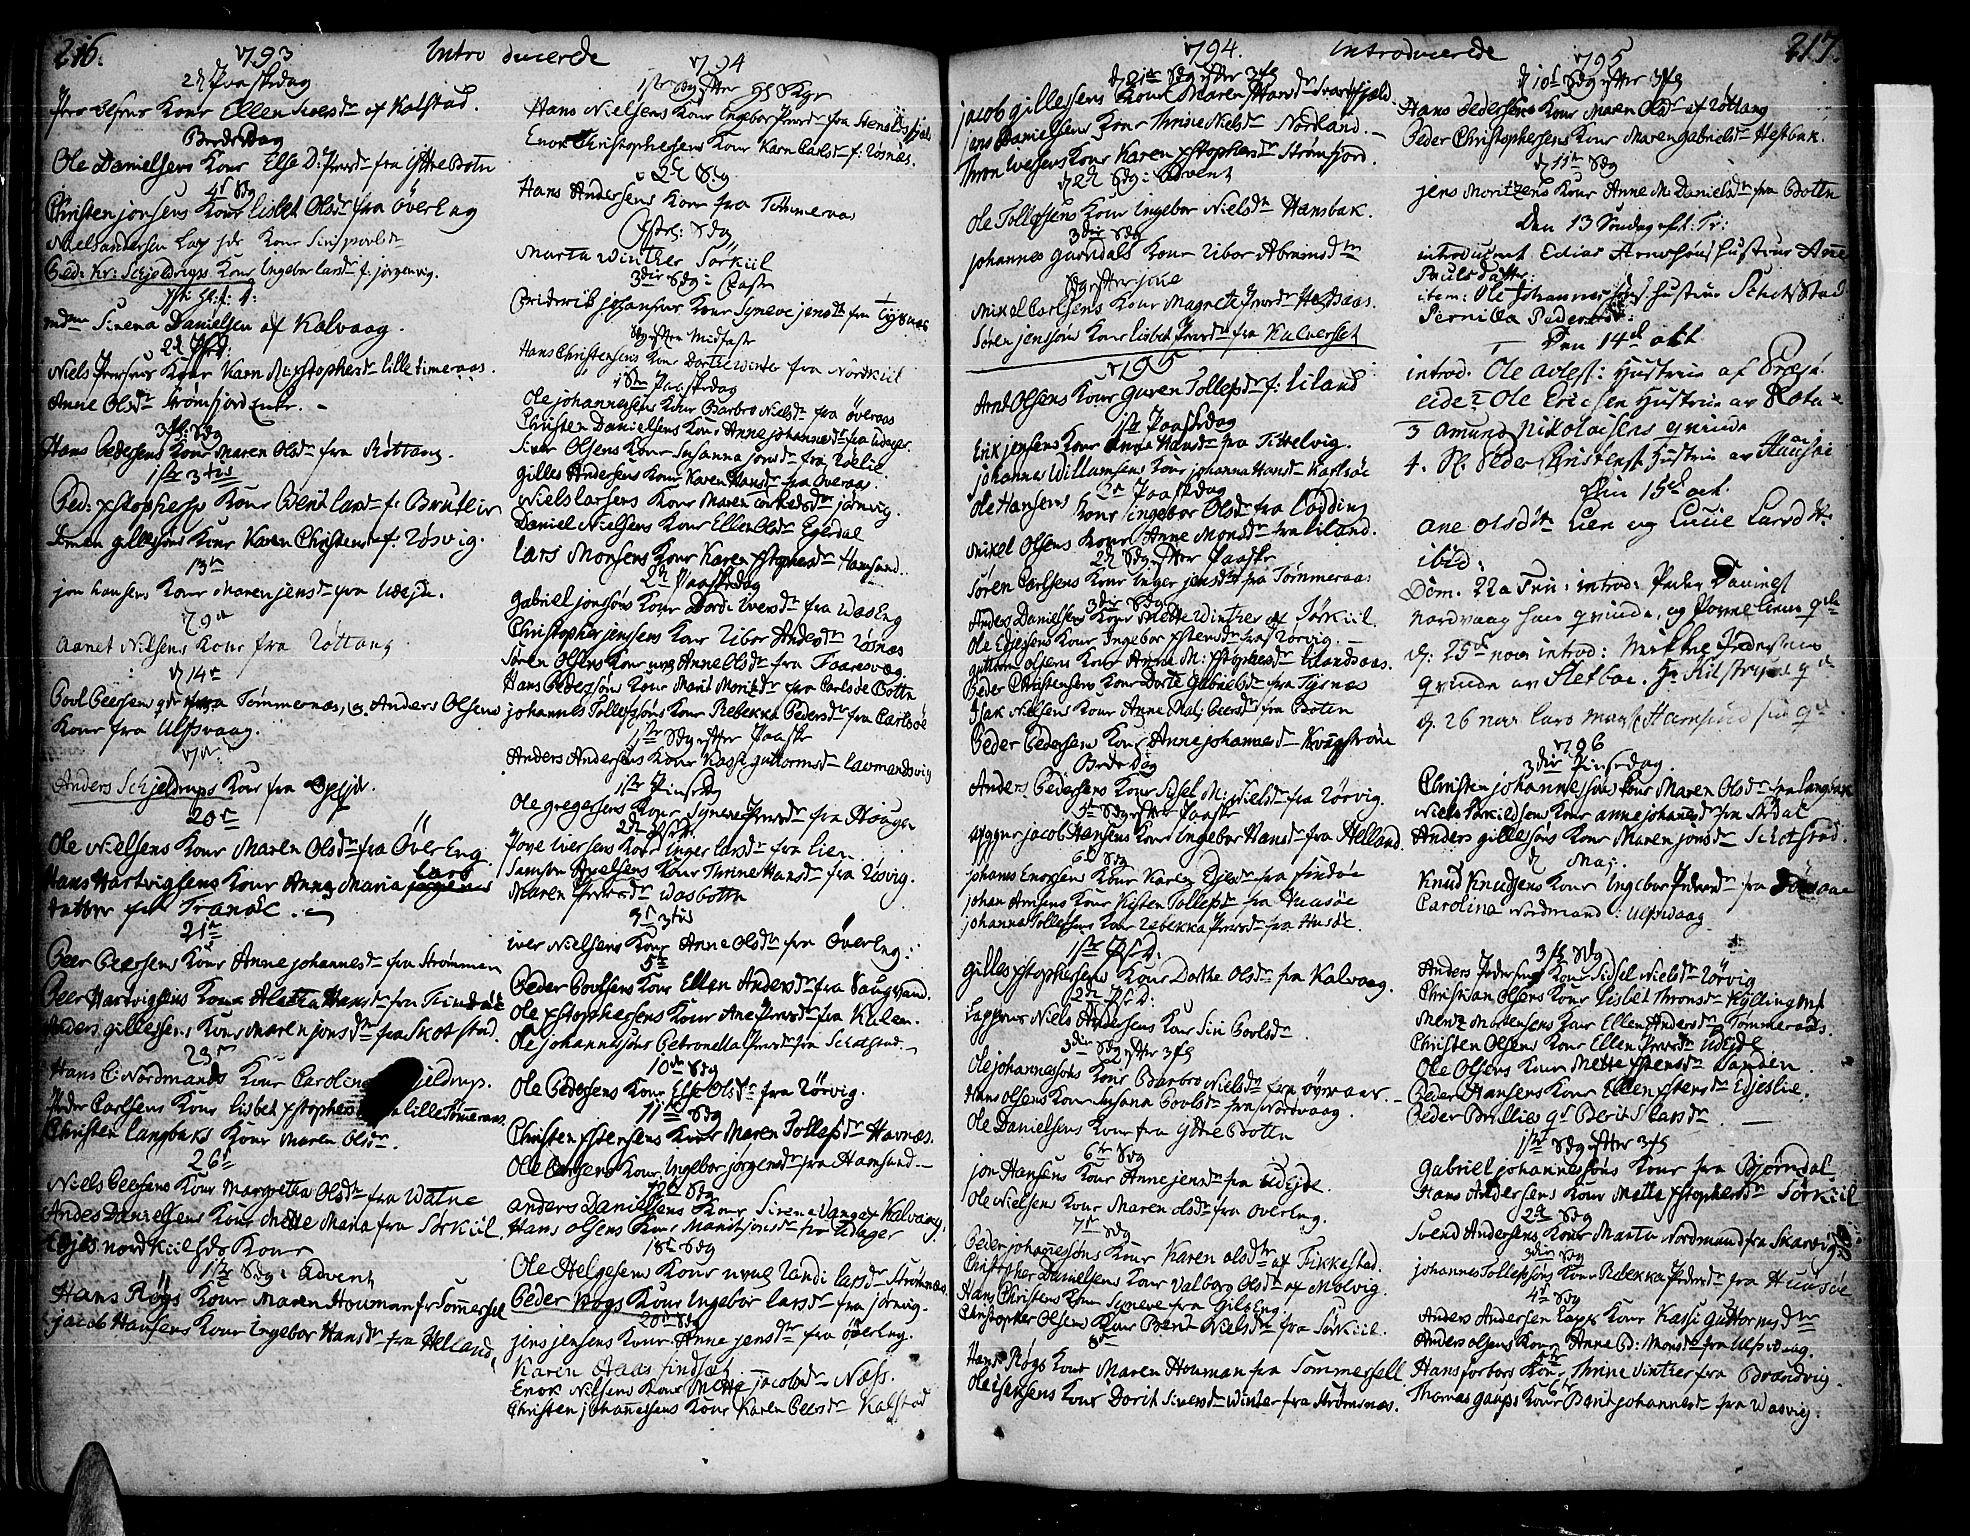 SAT, Ministerialprotokoller, klokkerbøker og fødselsregistre - Nordland, 859/L0841: Ministerialbok nr. 859A01, 1766-1821, s. 216-217